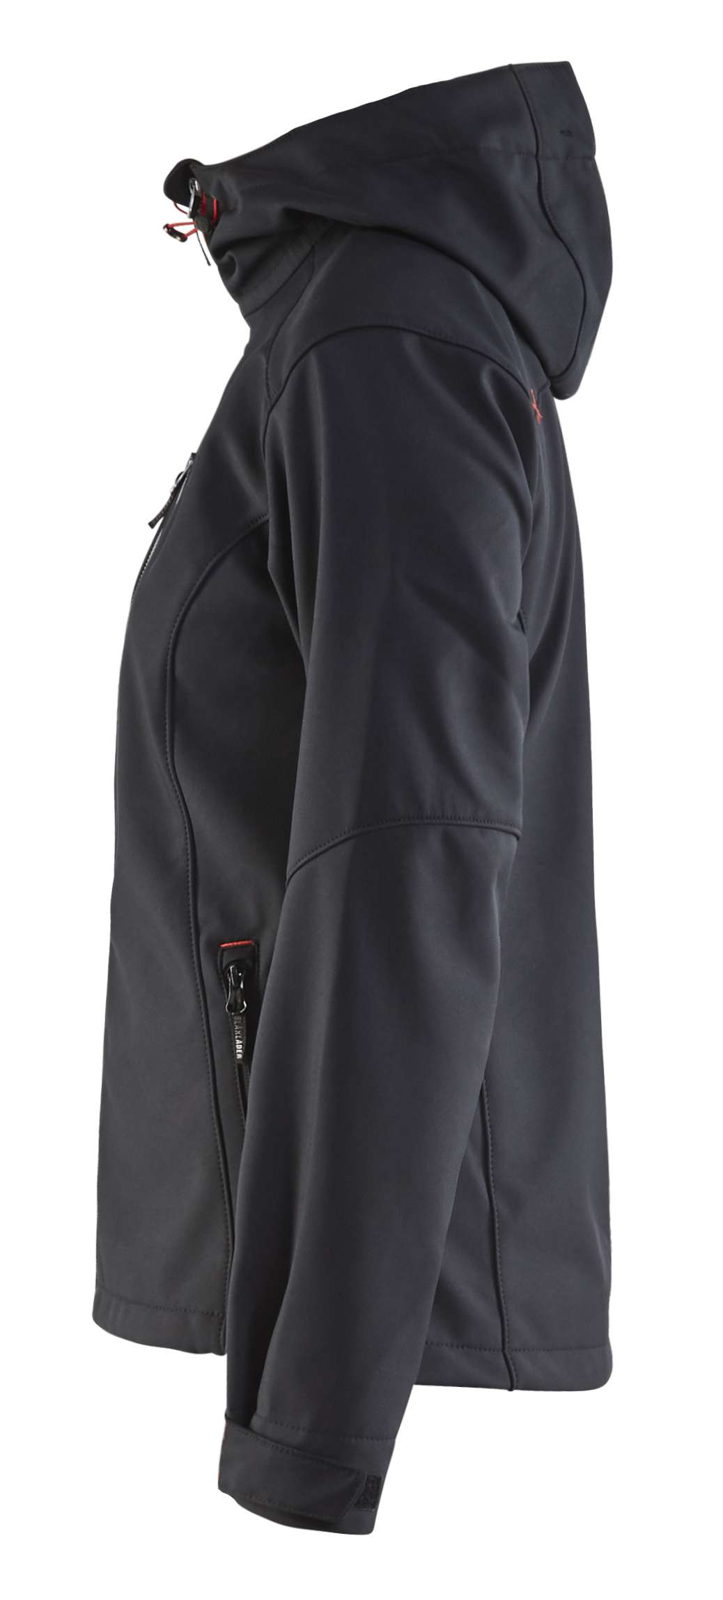 Blaklader Dames softshell jacks 49192517 zwart-rood(9956)